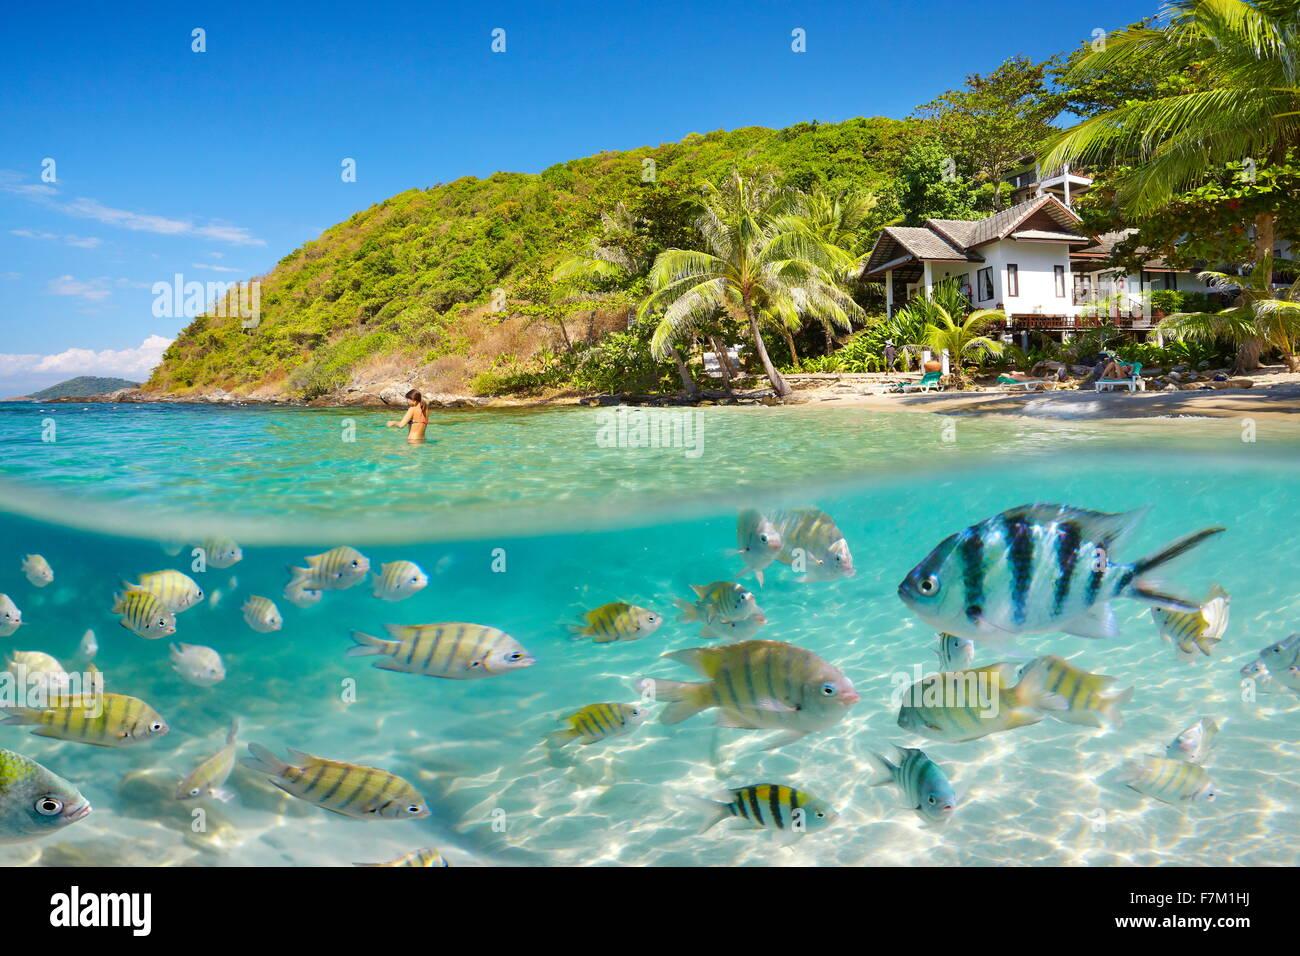 Vista mar submarino en Ko Samet Island Beach, Tailandia, Asia Foto de stock